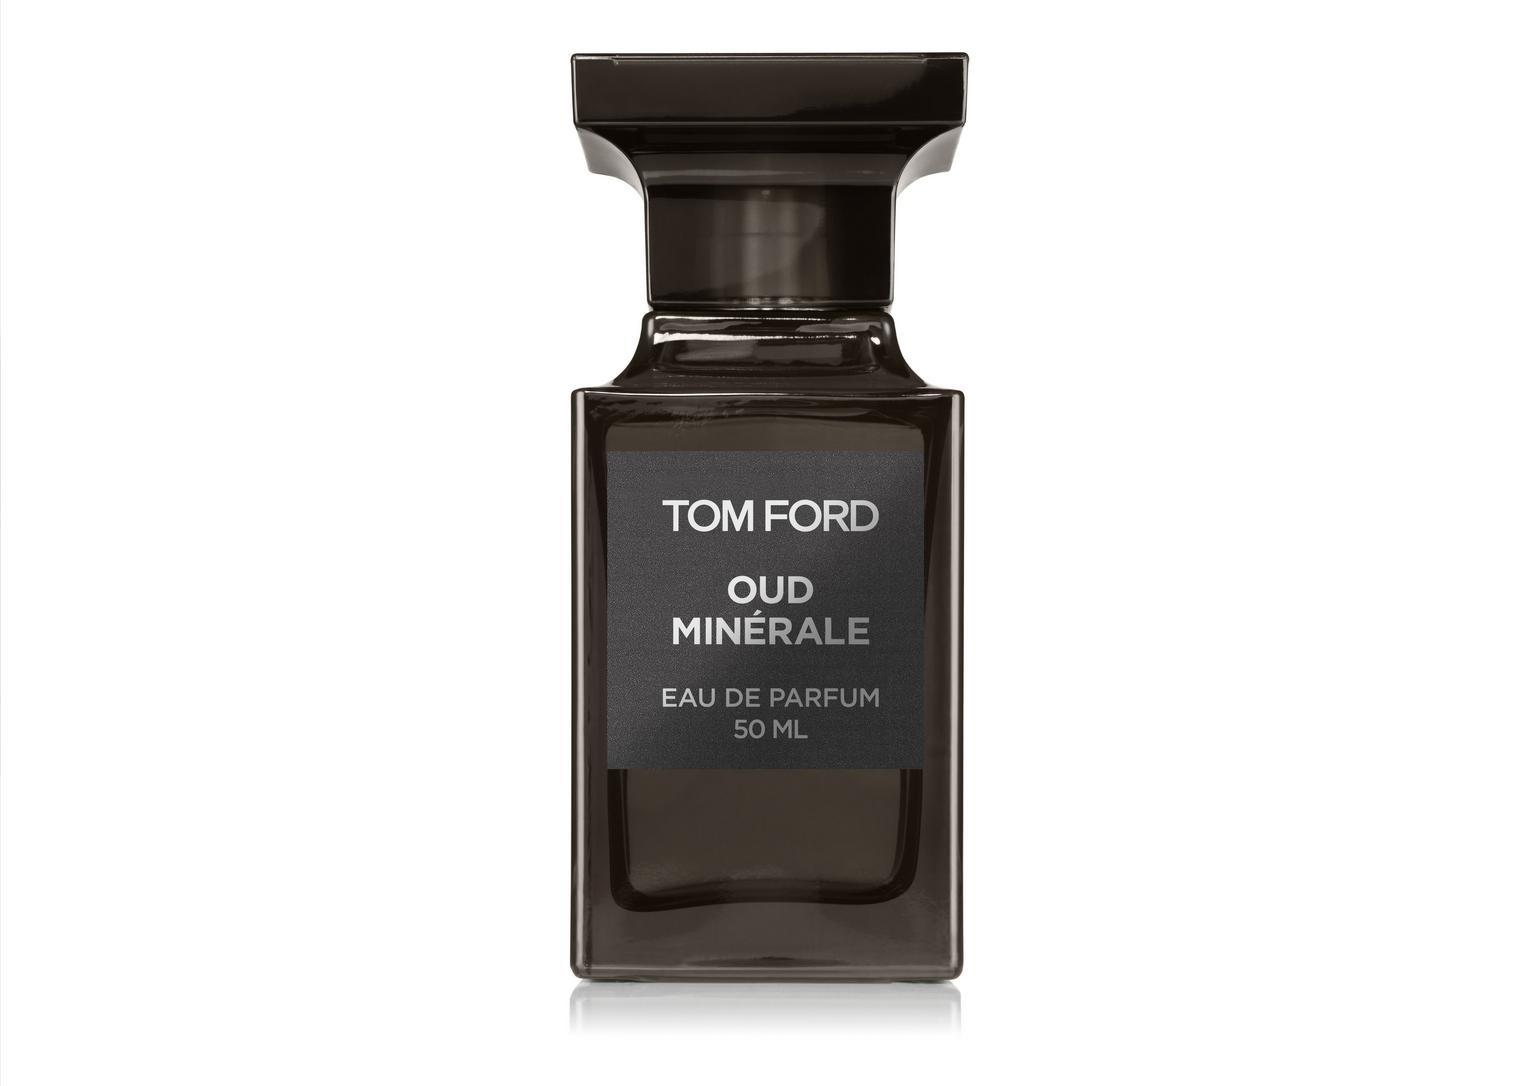 Tom Ford OUD MINÉRALE